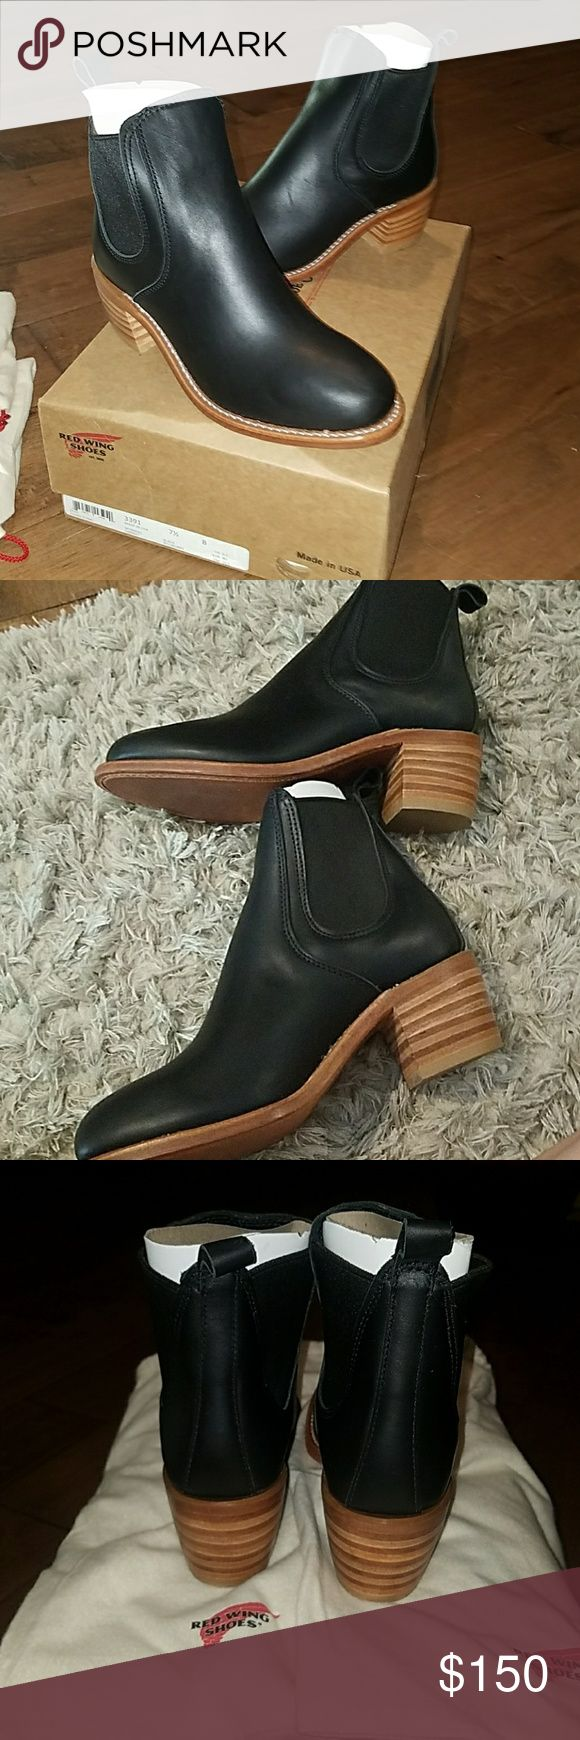 Redwing women's Harriet black boundary boots Black redwing boots Red Wing Shoes Shoes